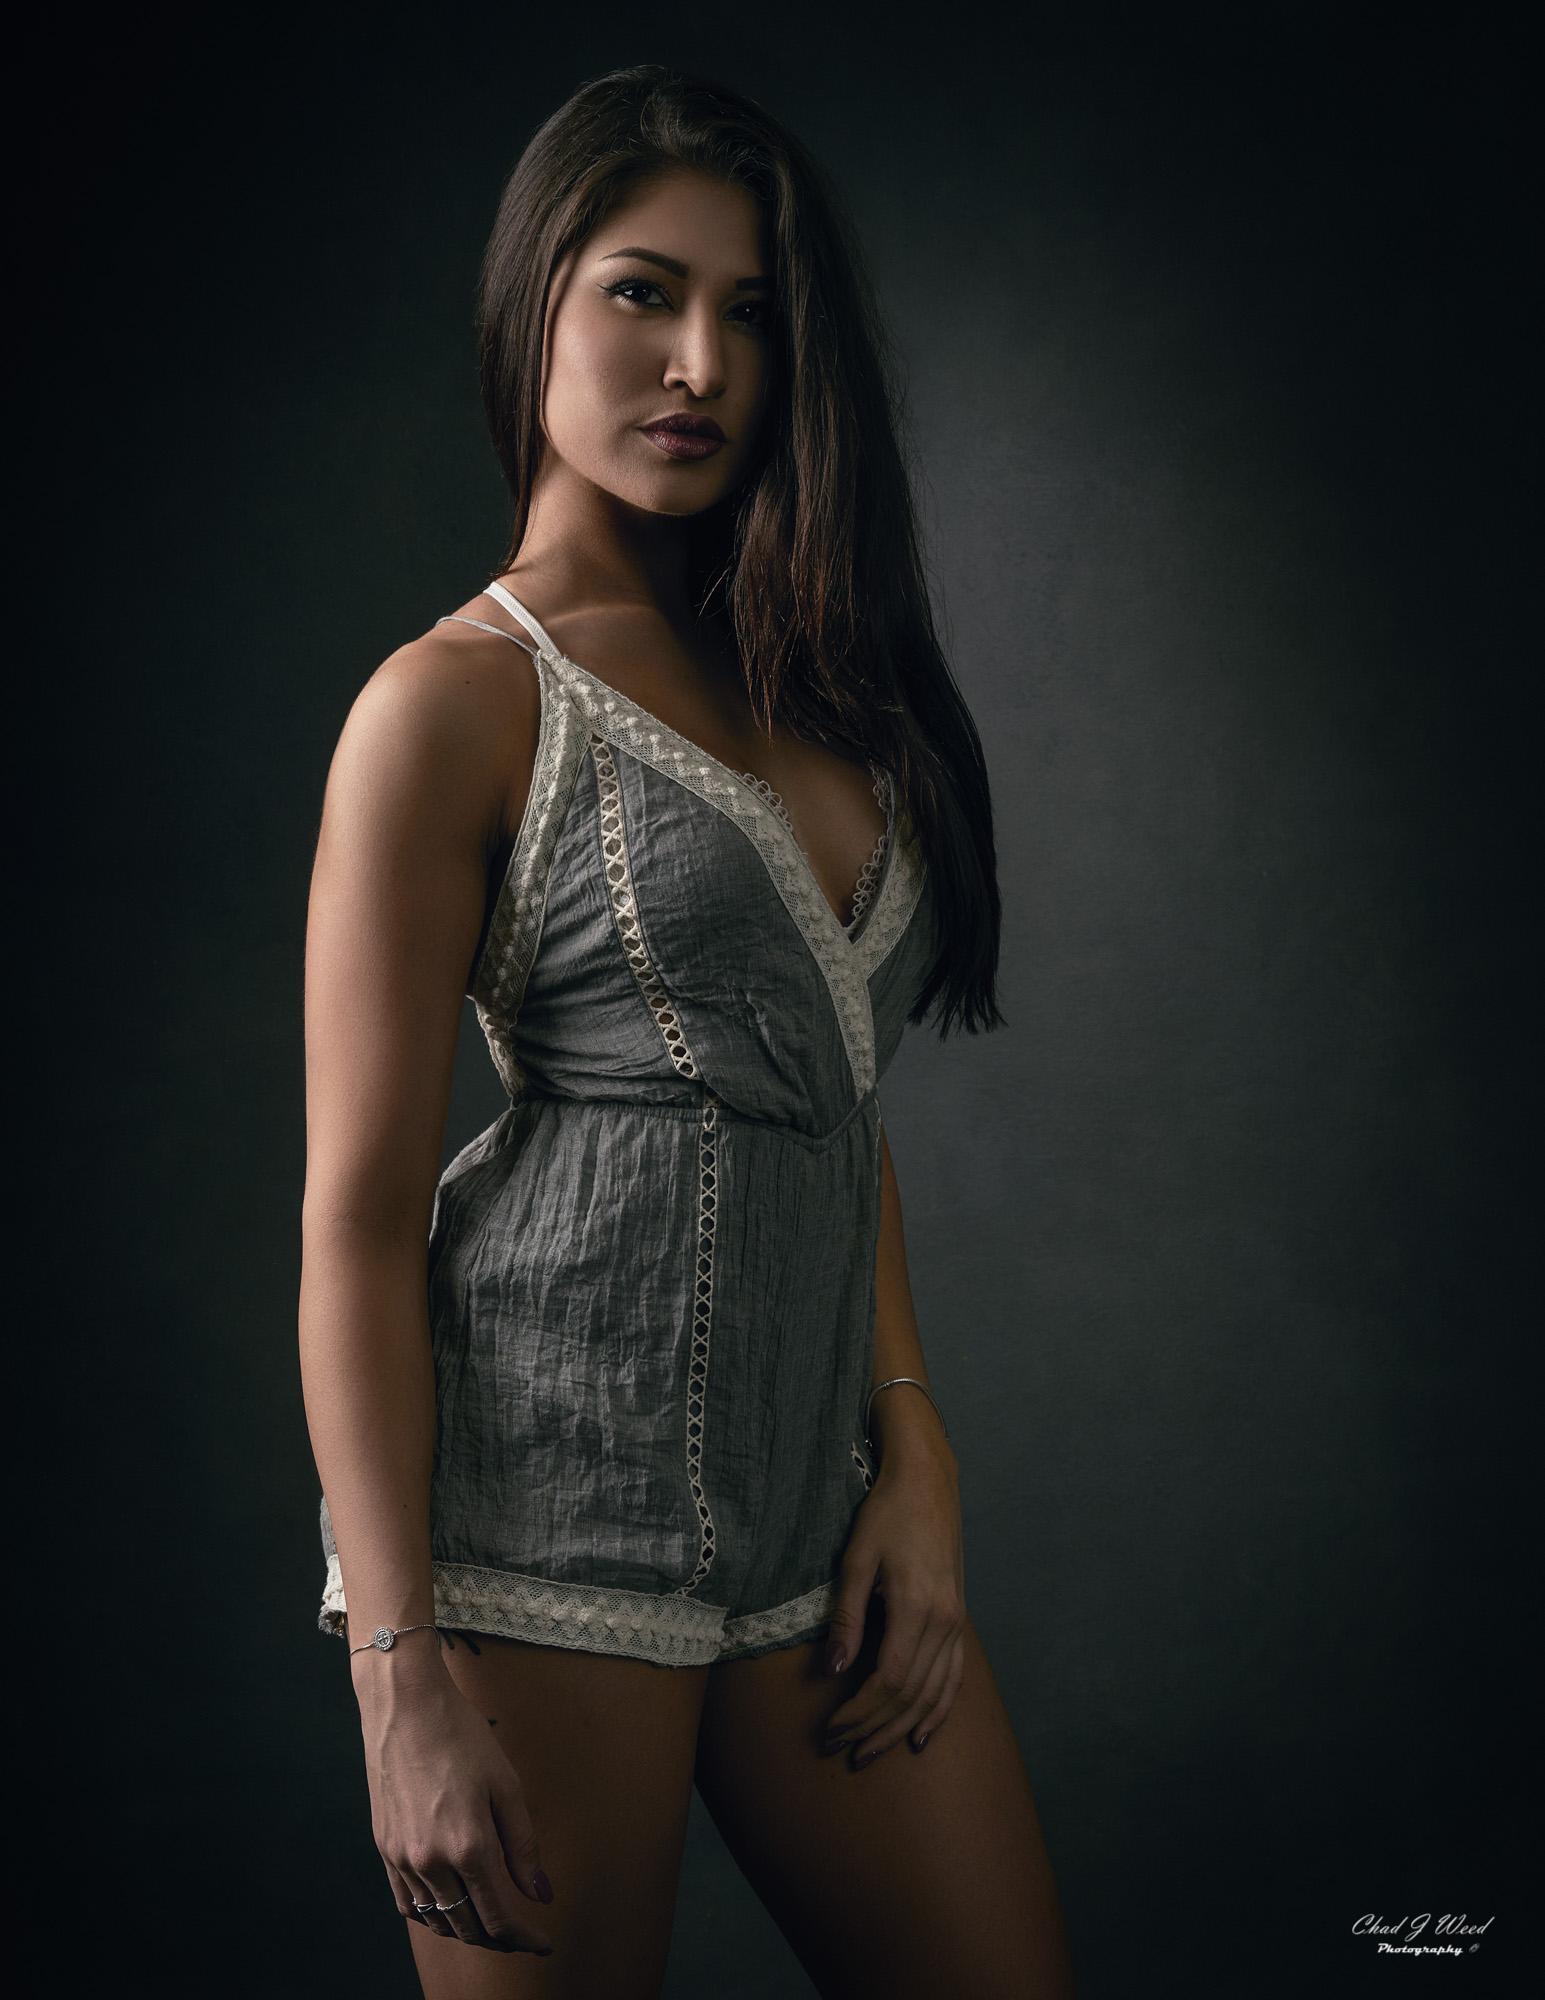 Arizona Fashion Photographer Chad Weed with Fitness Model Ashly 2